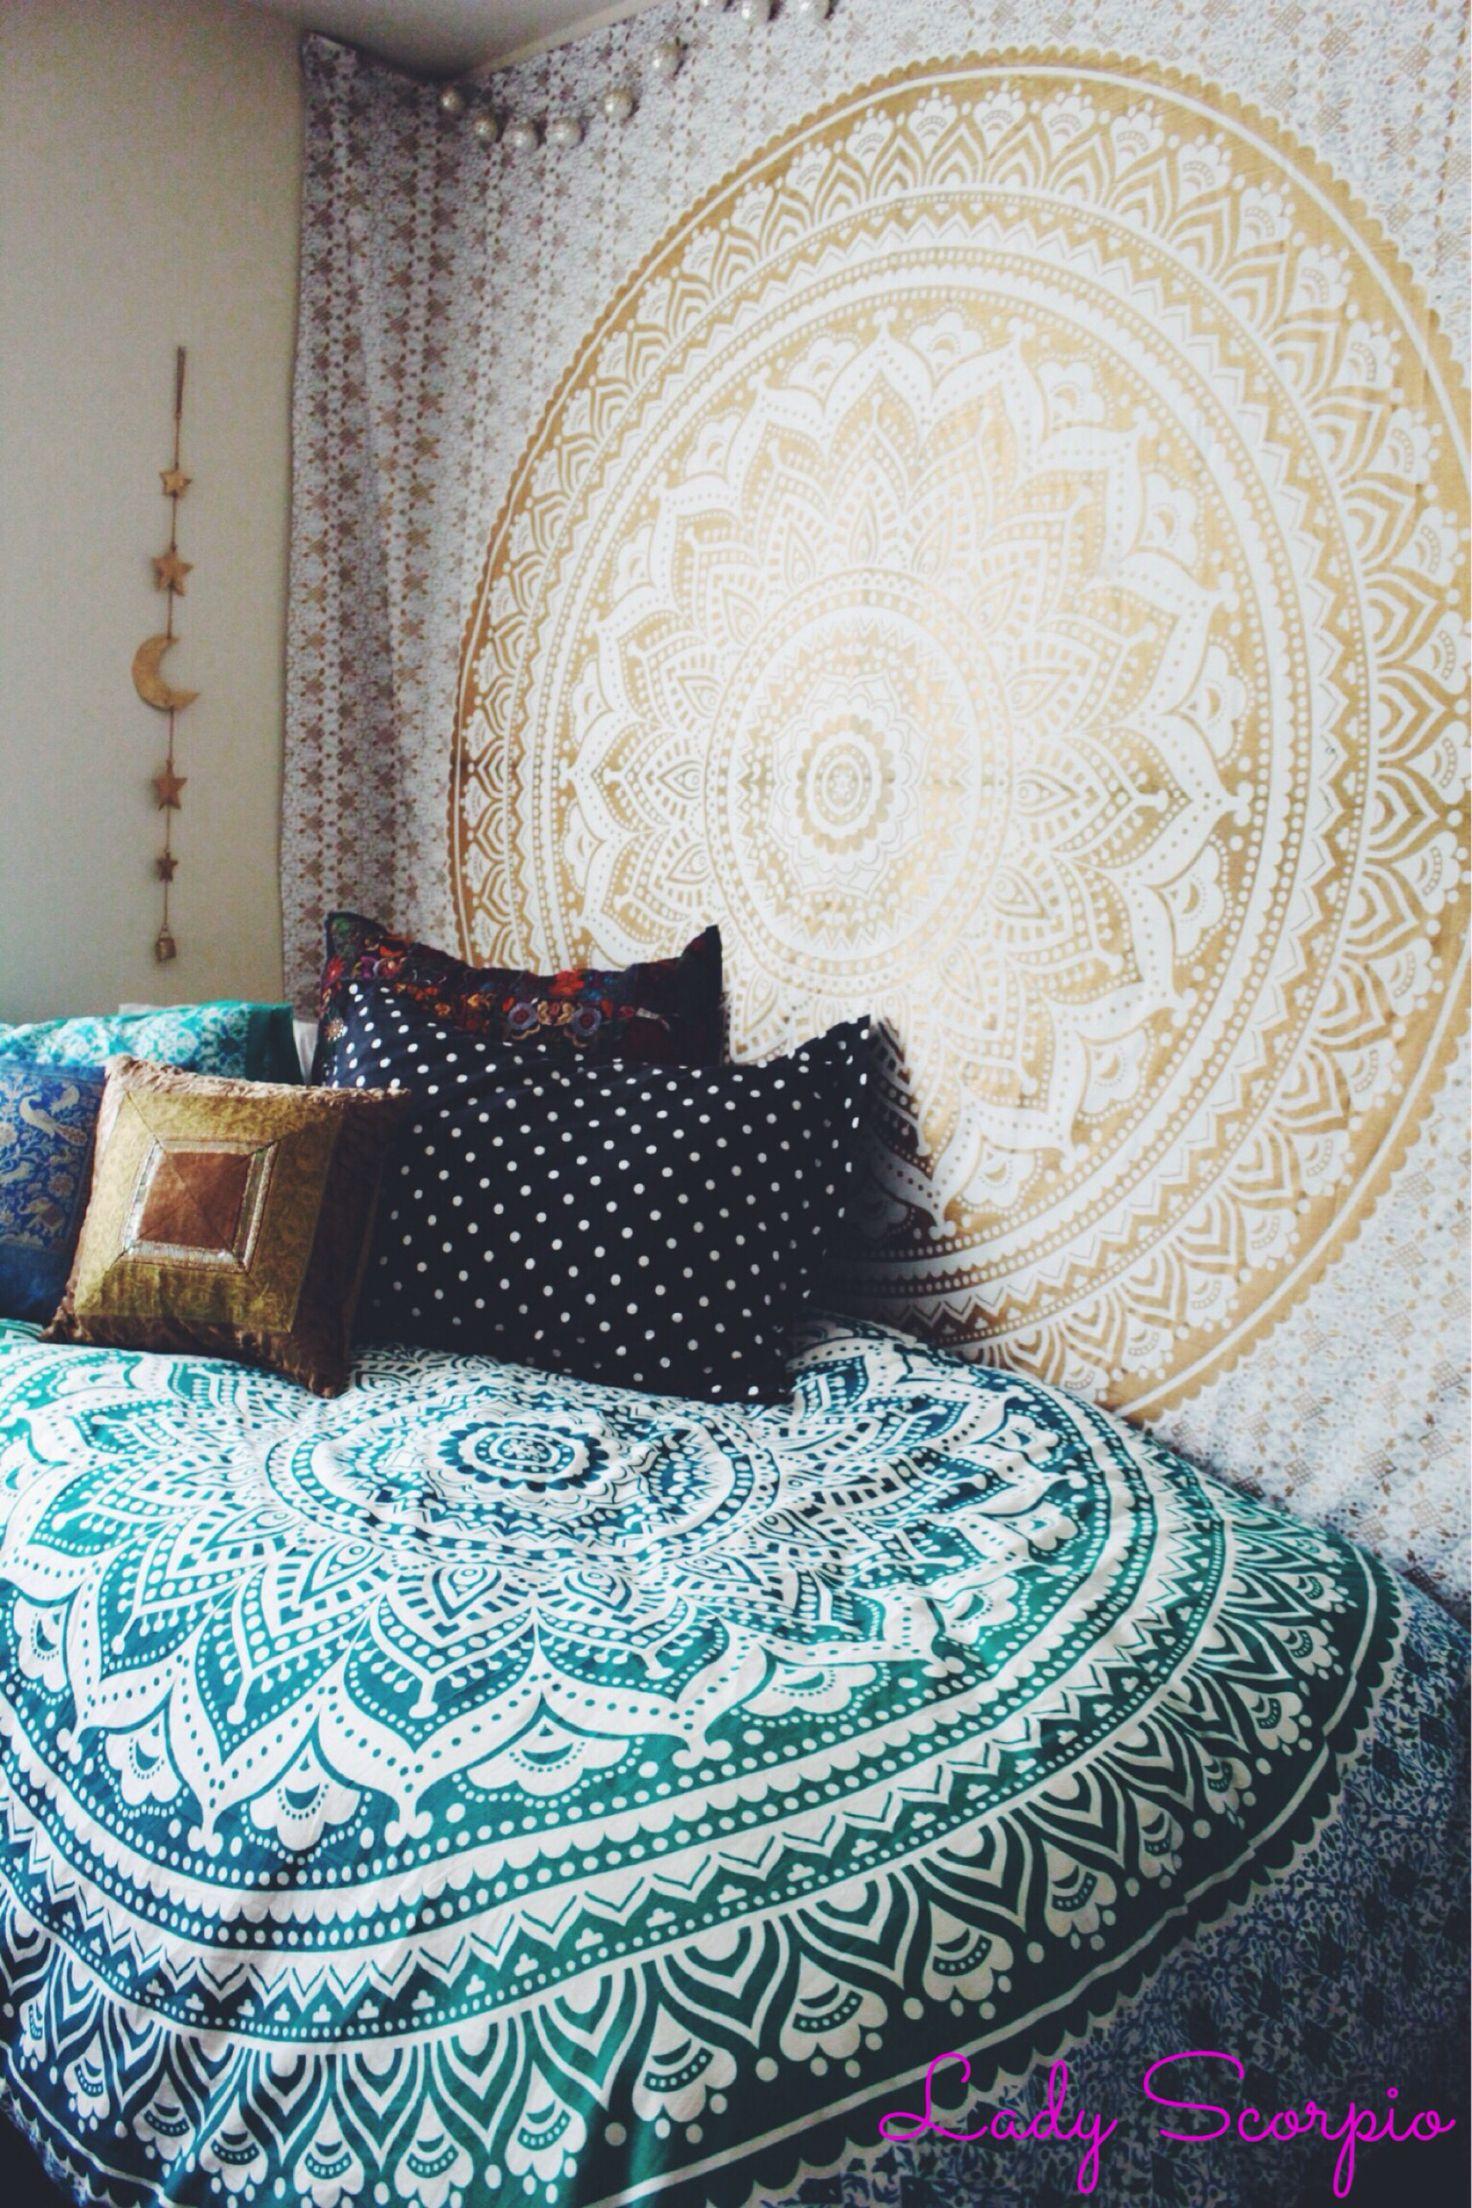 Lady Scorpio Bedroom. Turquoise & Gold Hippy Trippy Duvet & Mandala Tapestry